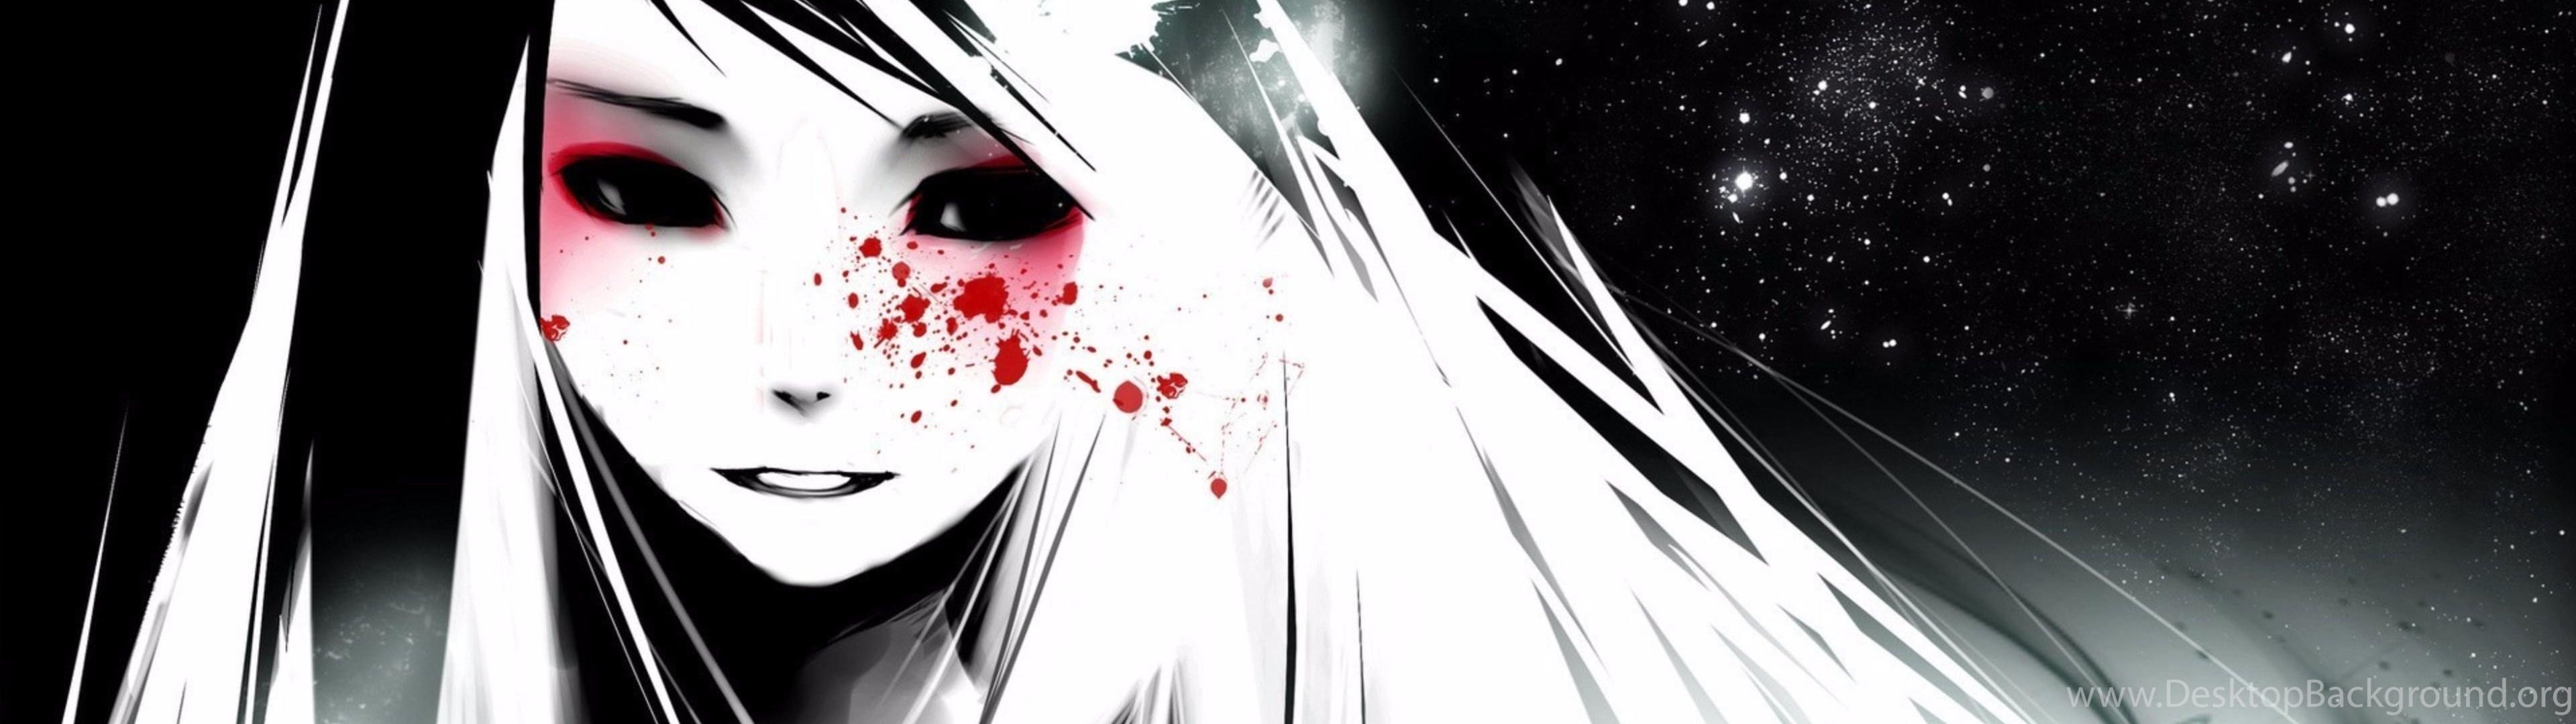 Red Tears 4K Anime Wallpapers Desktop Background